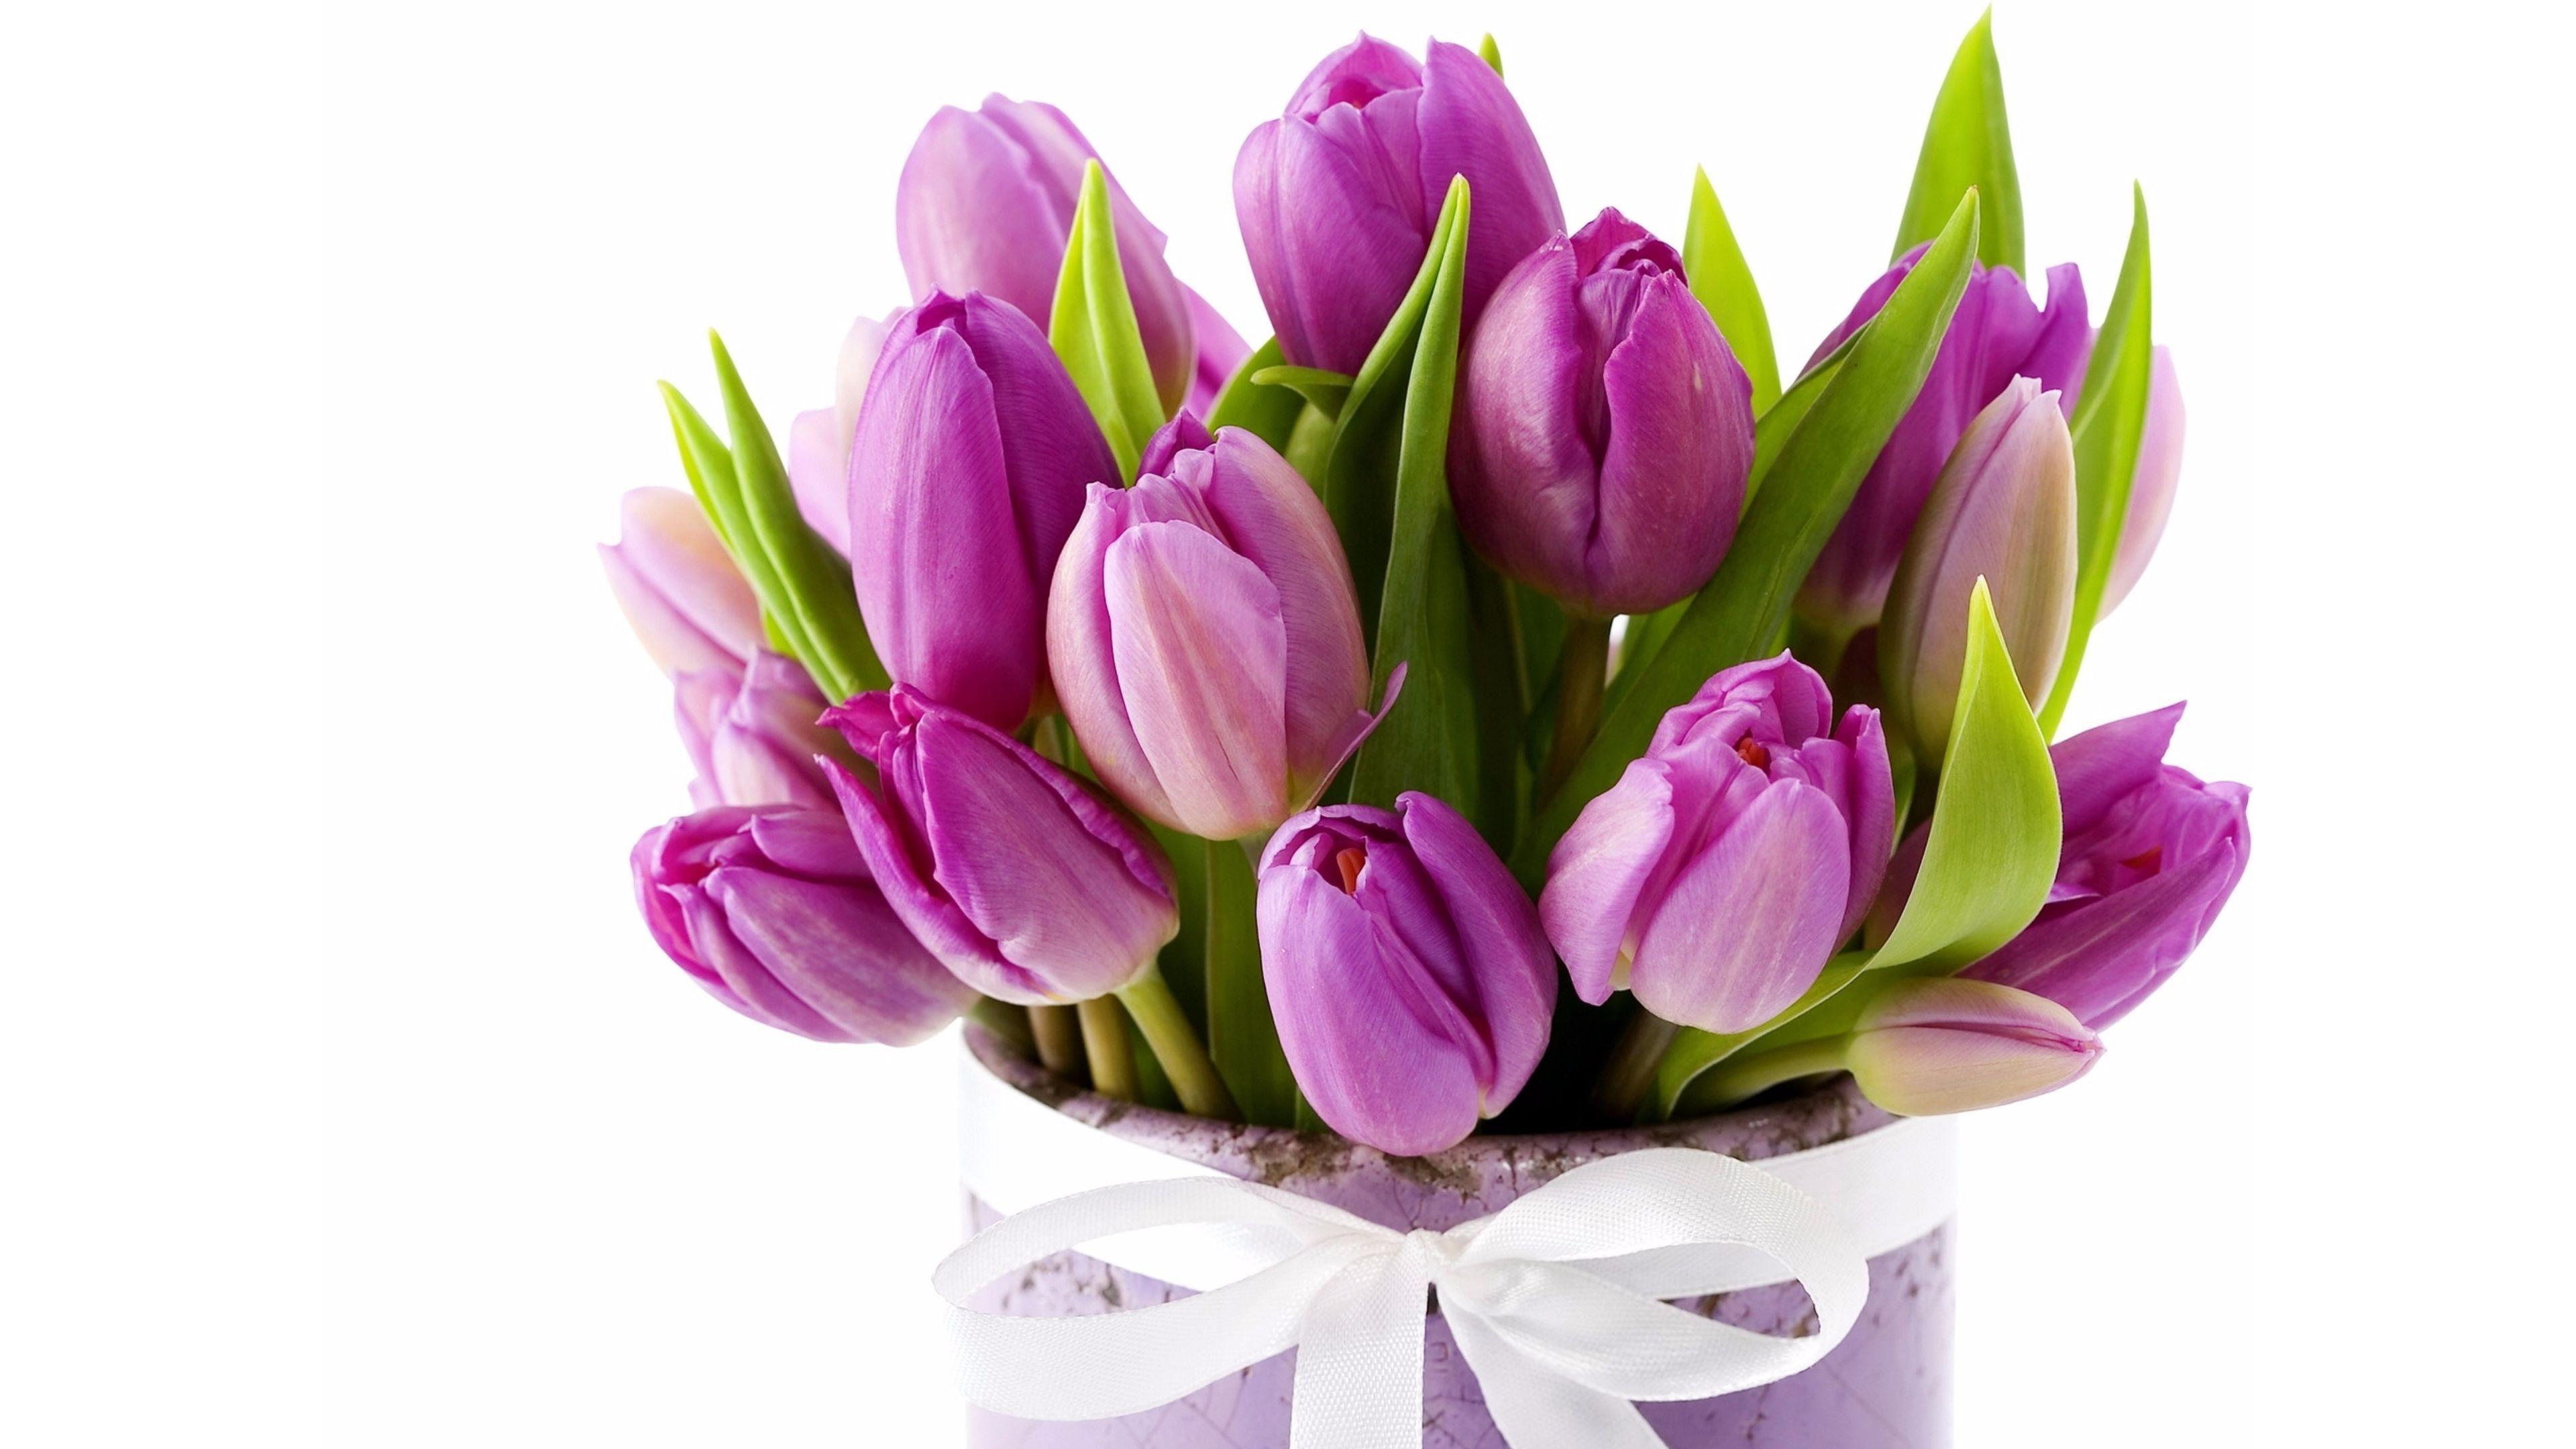 YouWall Purple Tulips Wallpaper Wallpaperwallpapersfree